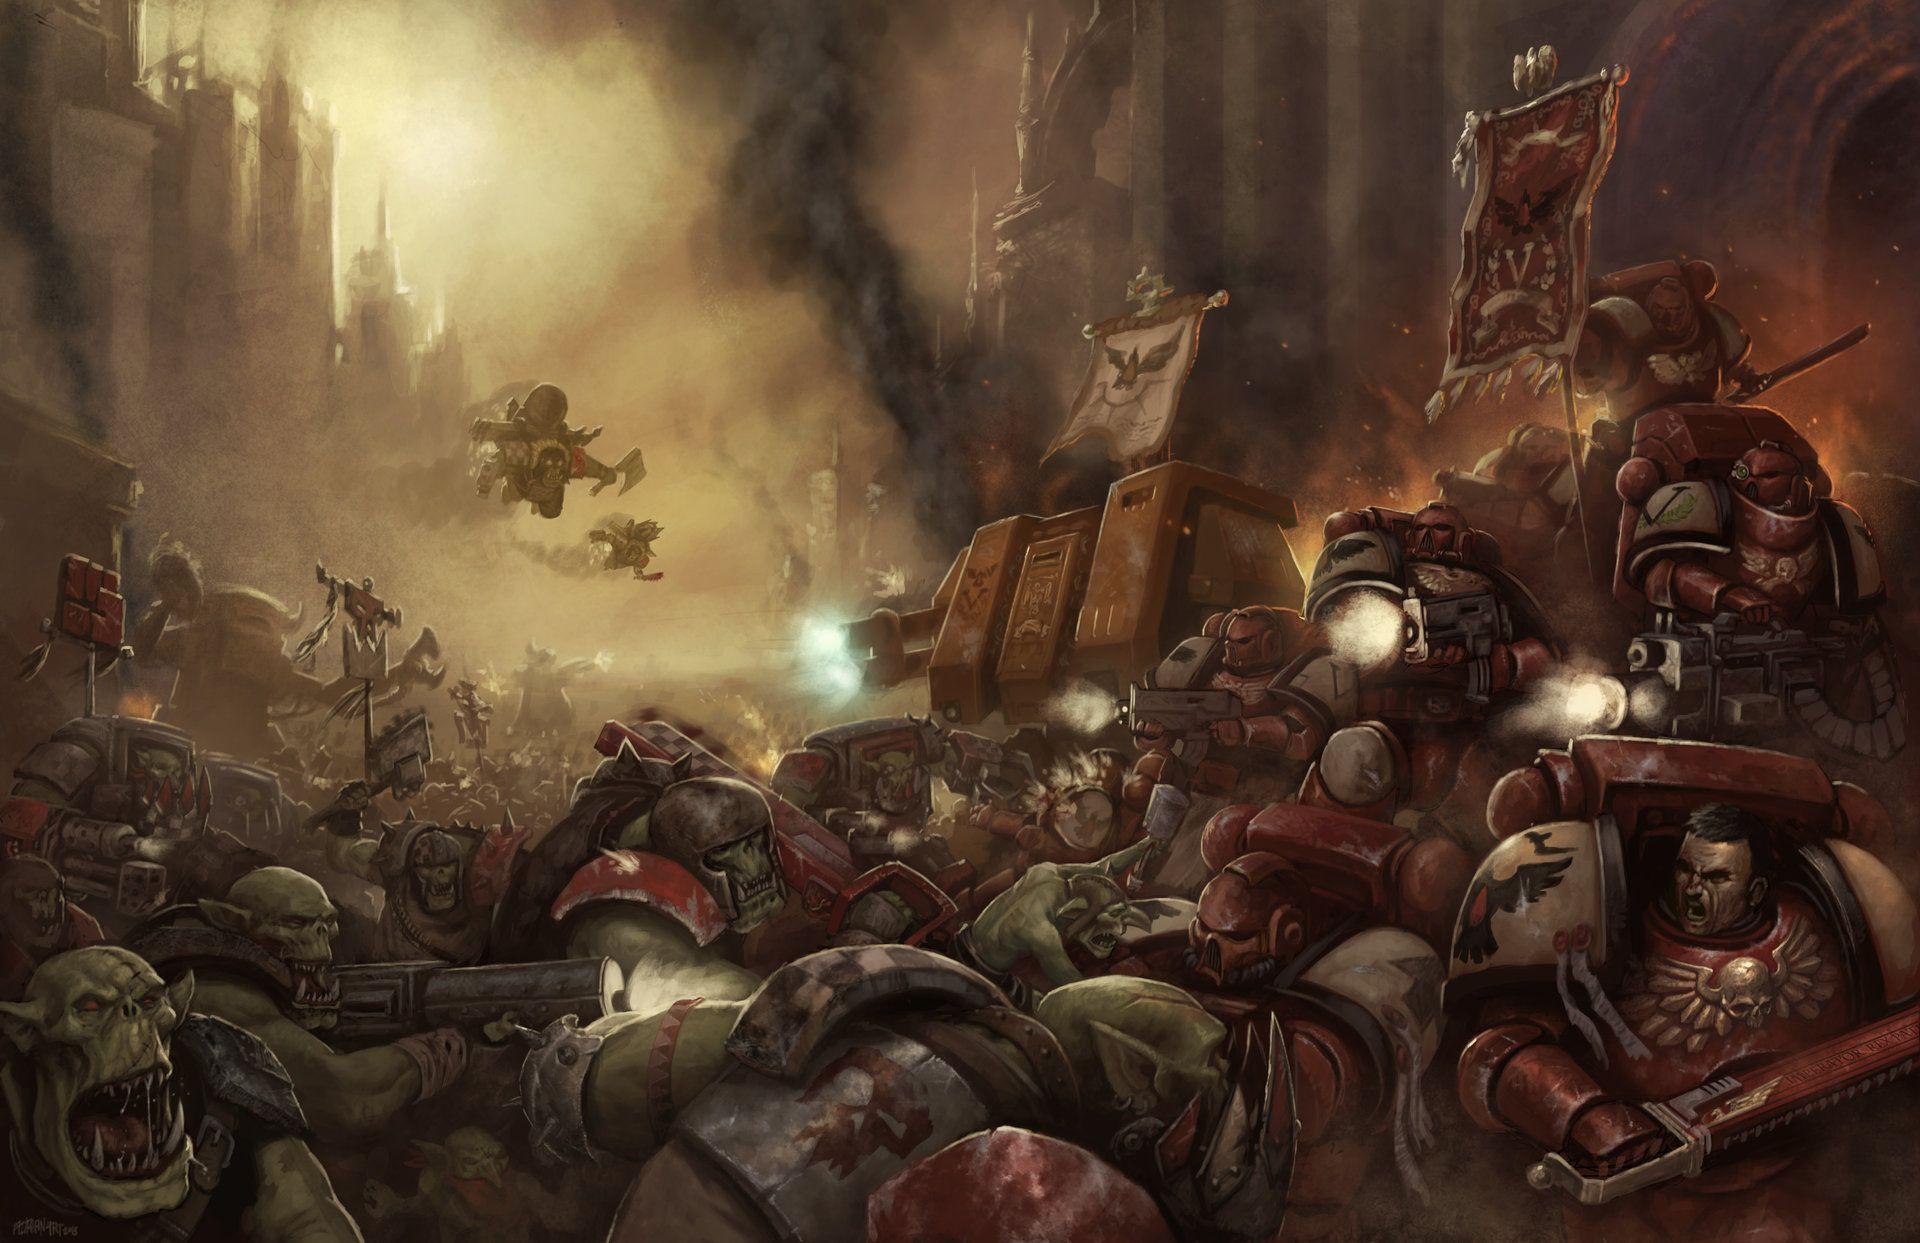 40k Wallpapers Album On Imgur Warhammer Warhammer 40k Artwork Raven Artwork